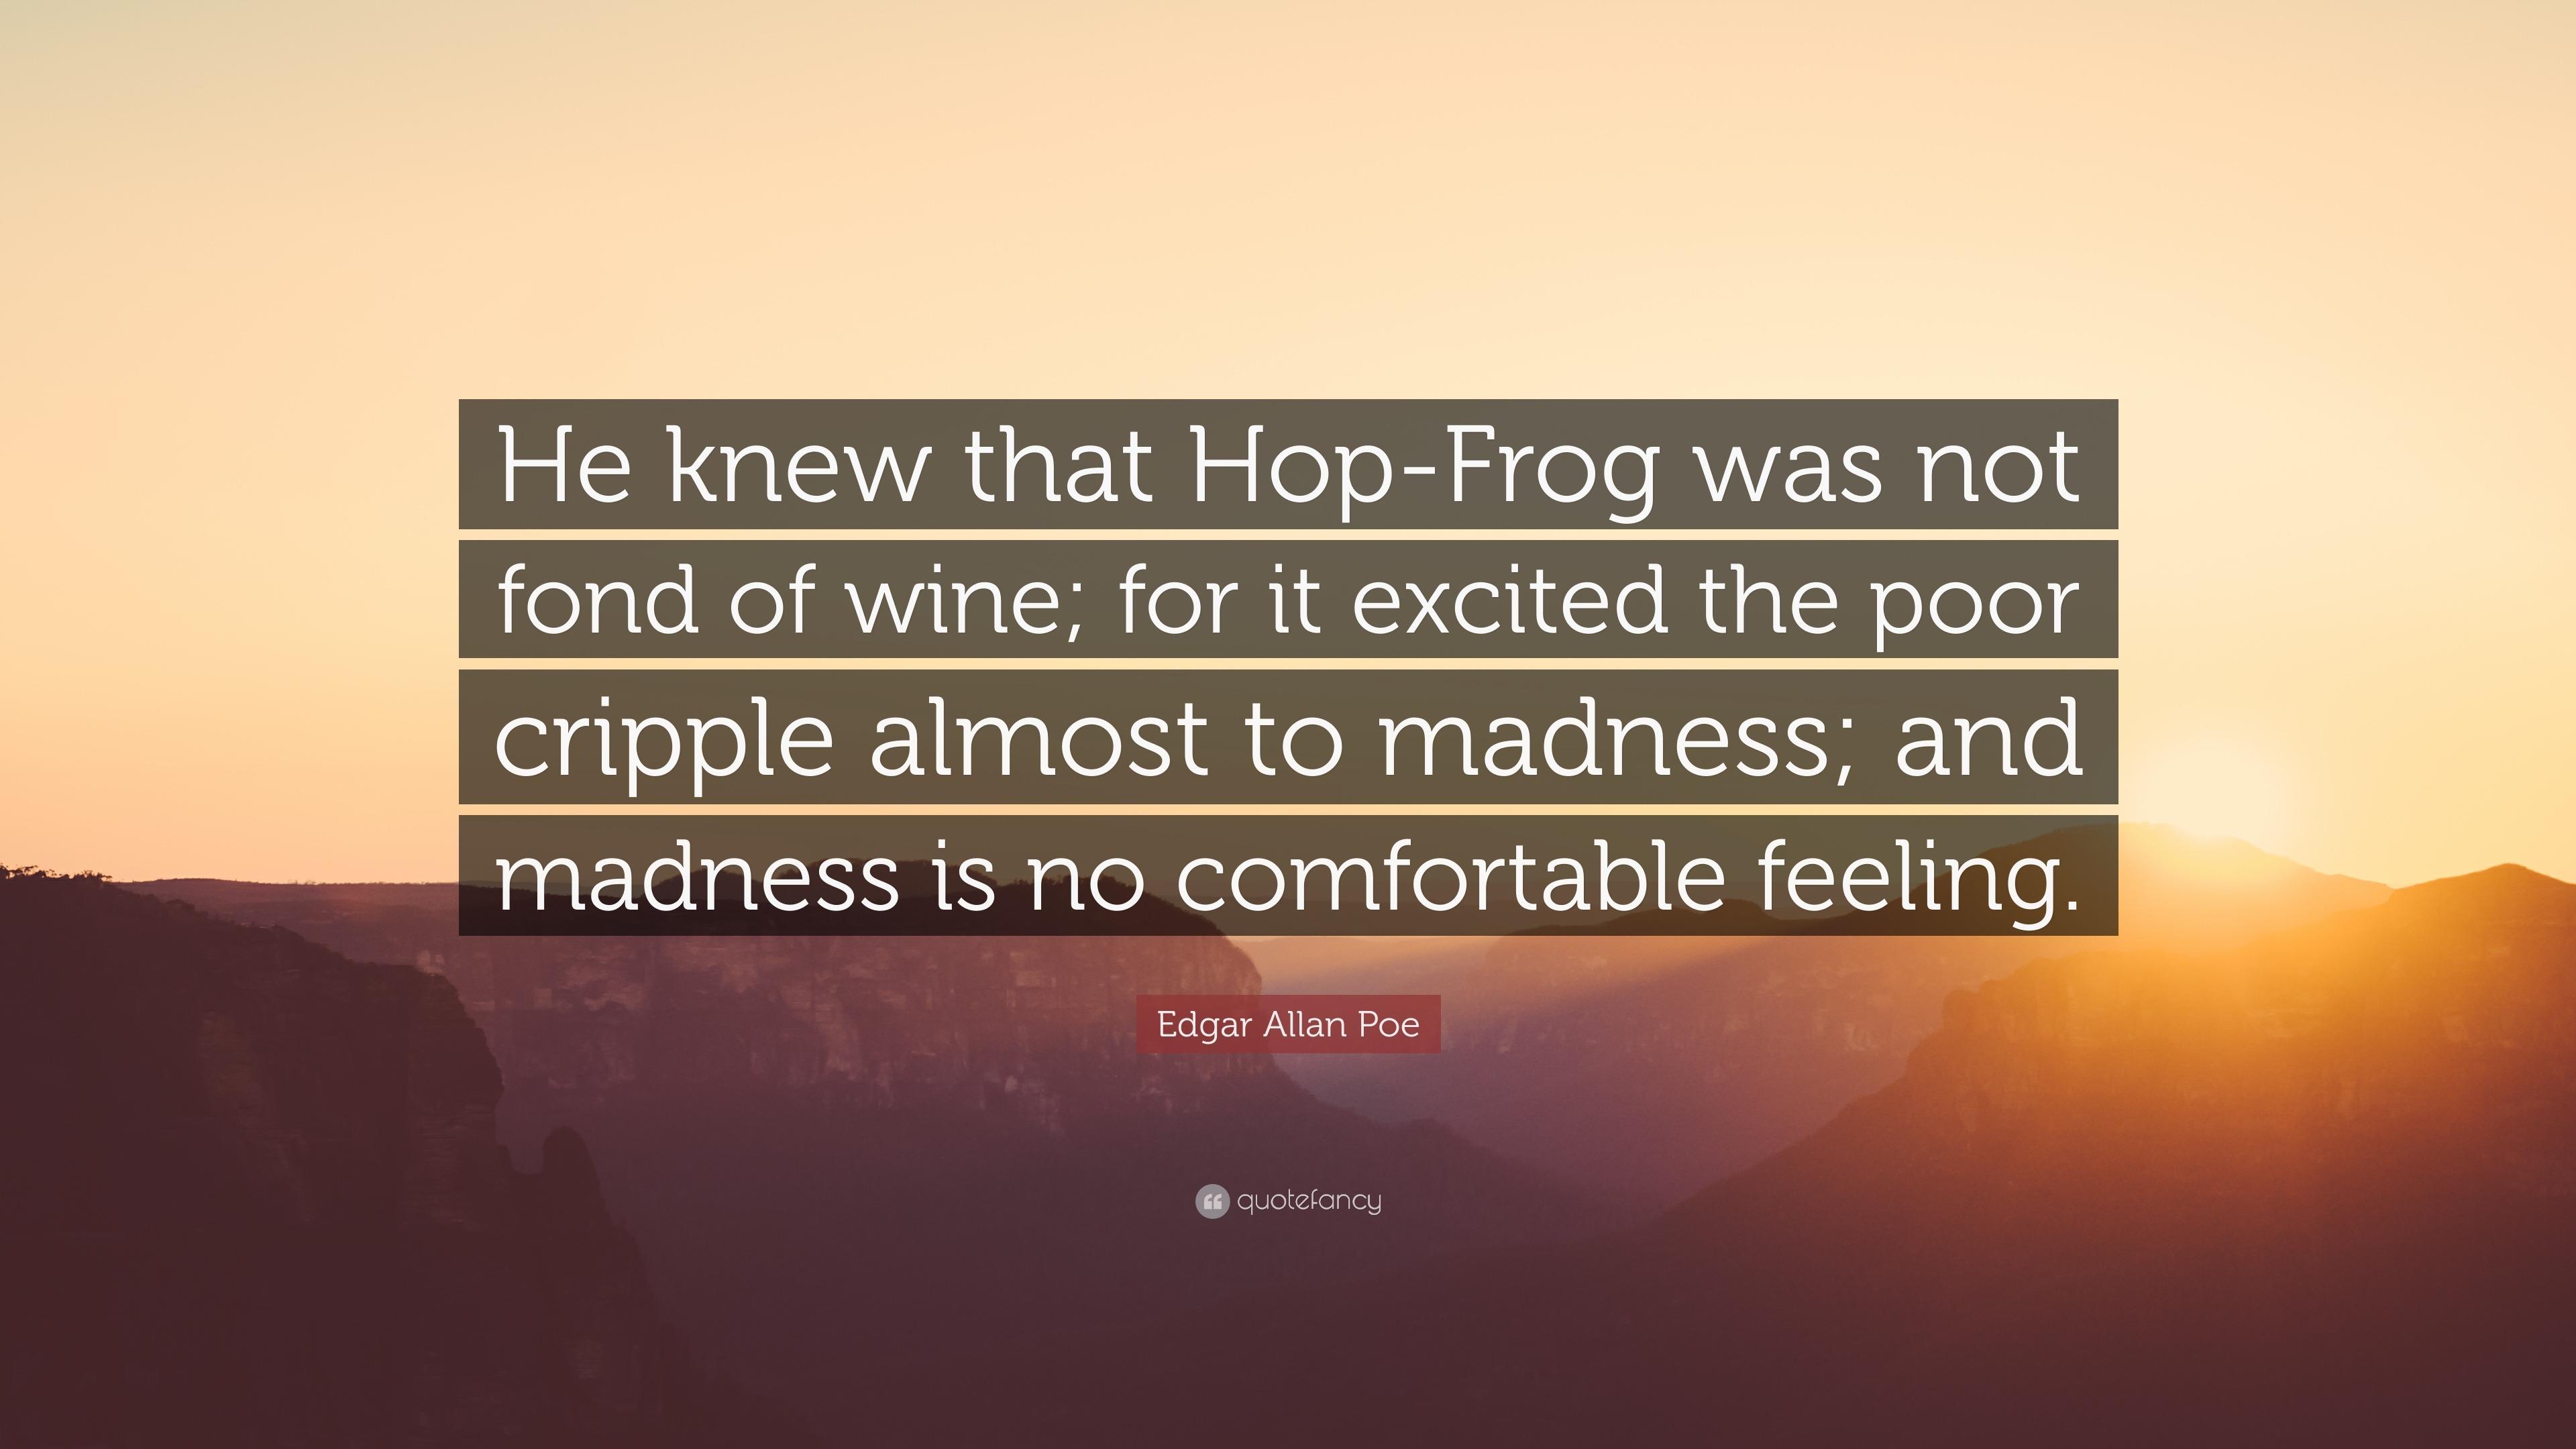 hop frog